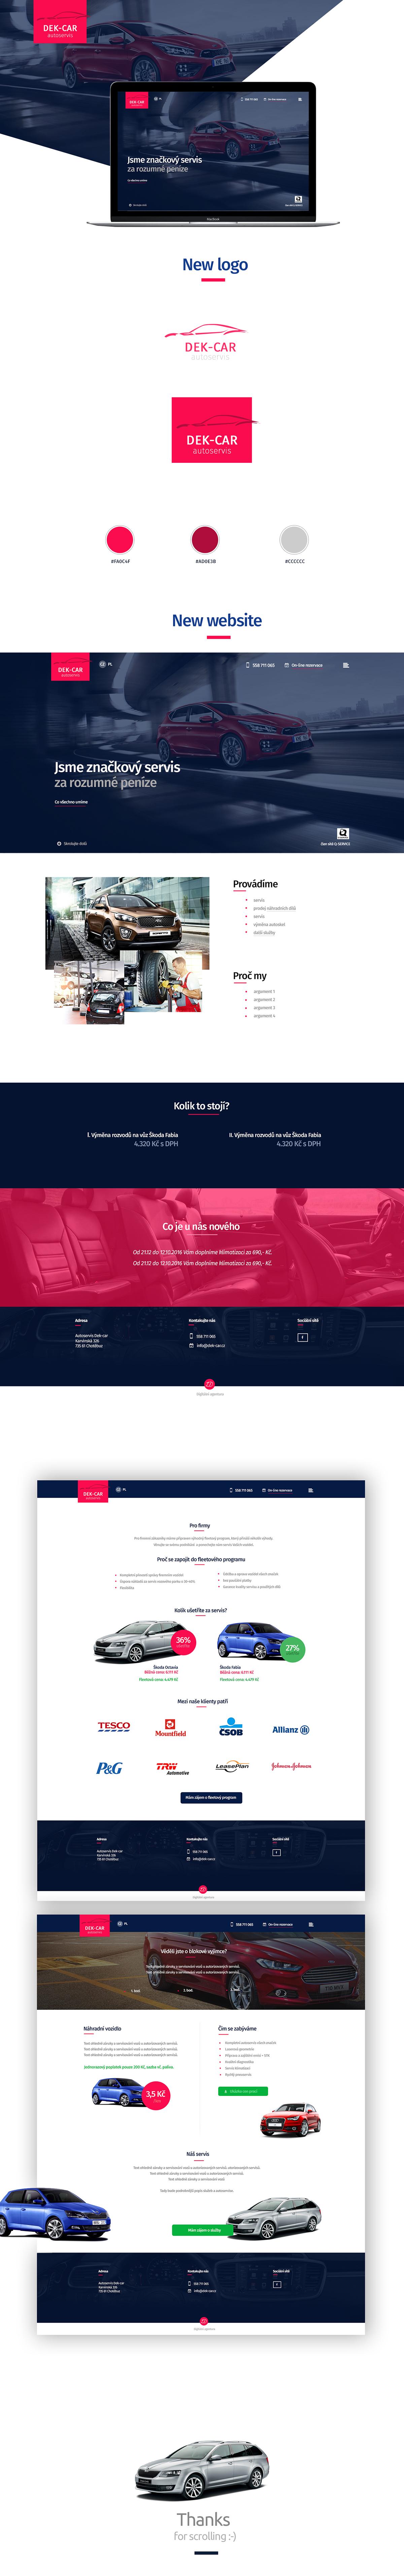 autoservis Repair desing car service Webdesign Responsive Design ux UI